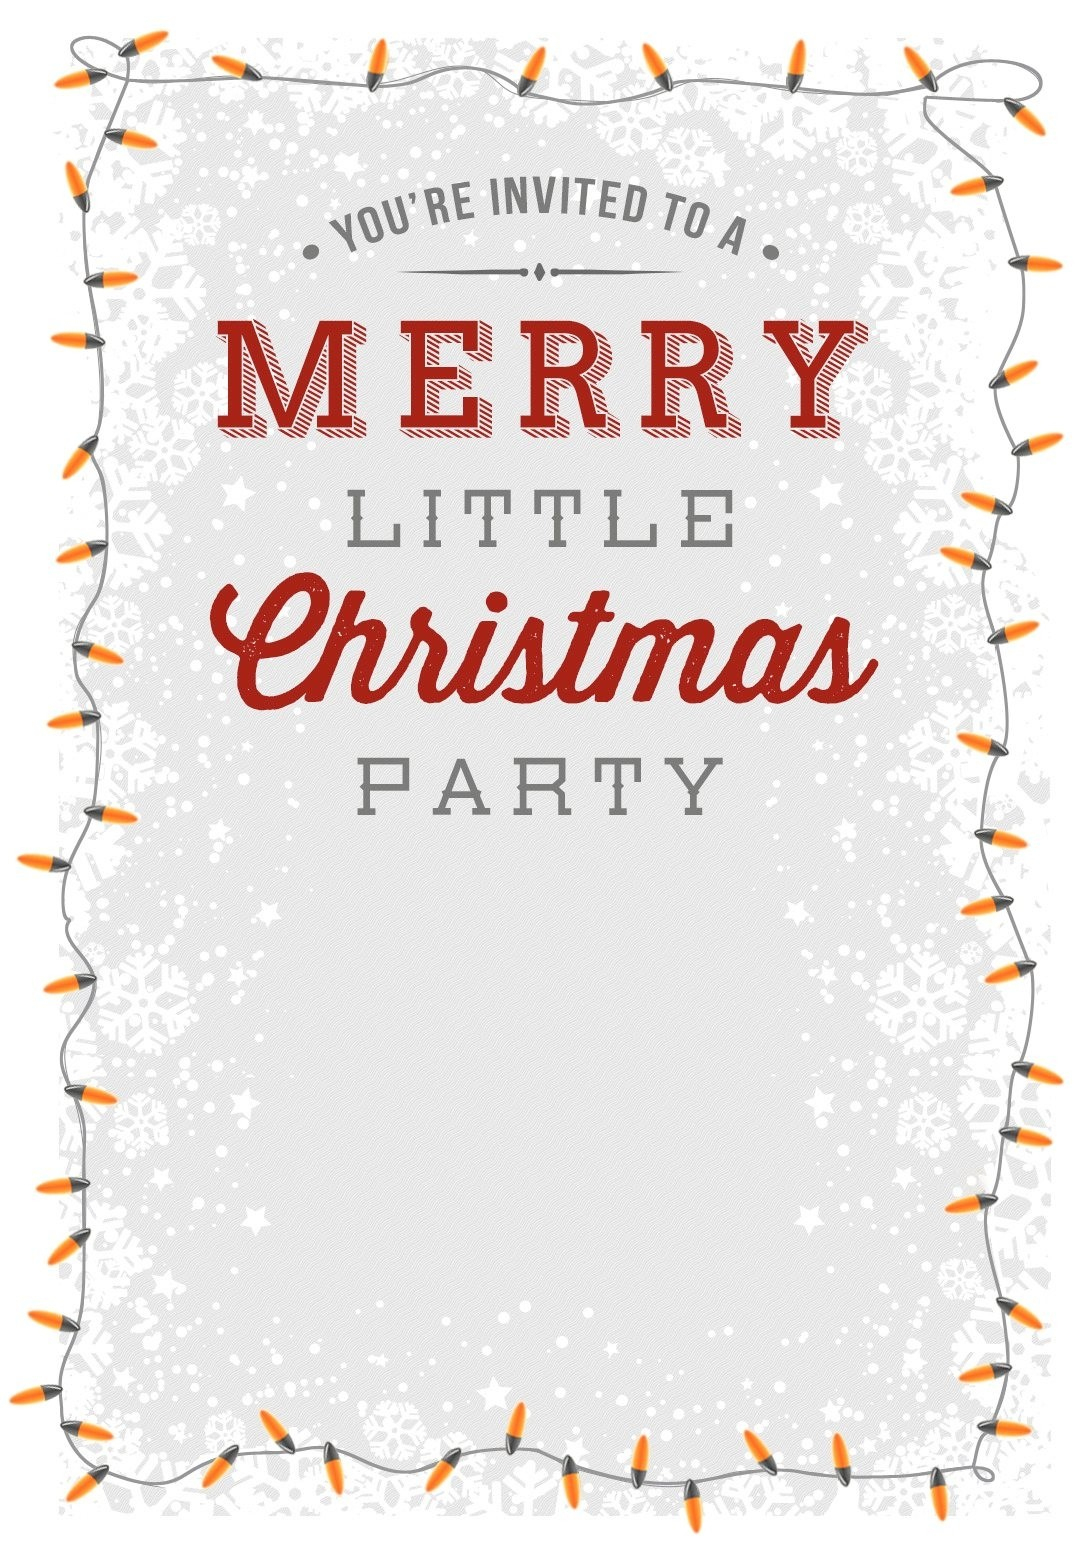 Free Printable Christmas Party Flyer Templates Holiday Invitation - Holiday Invitations Free Printable